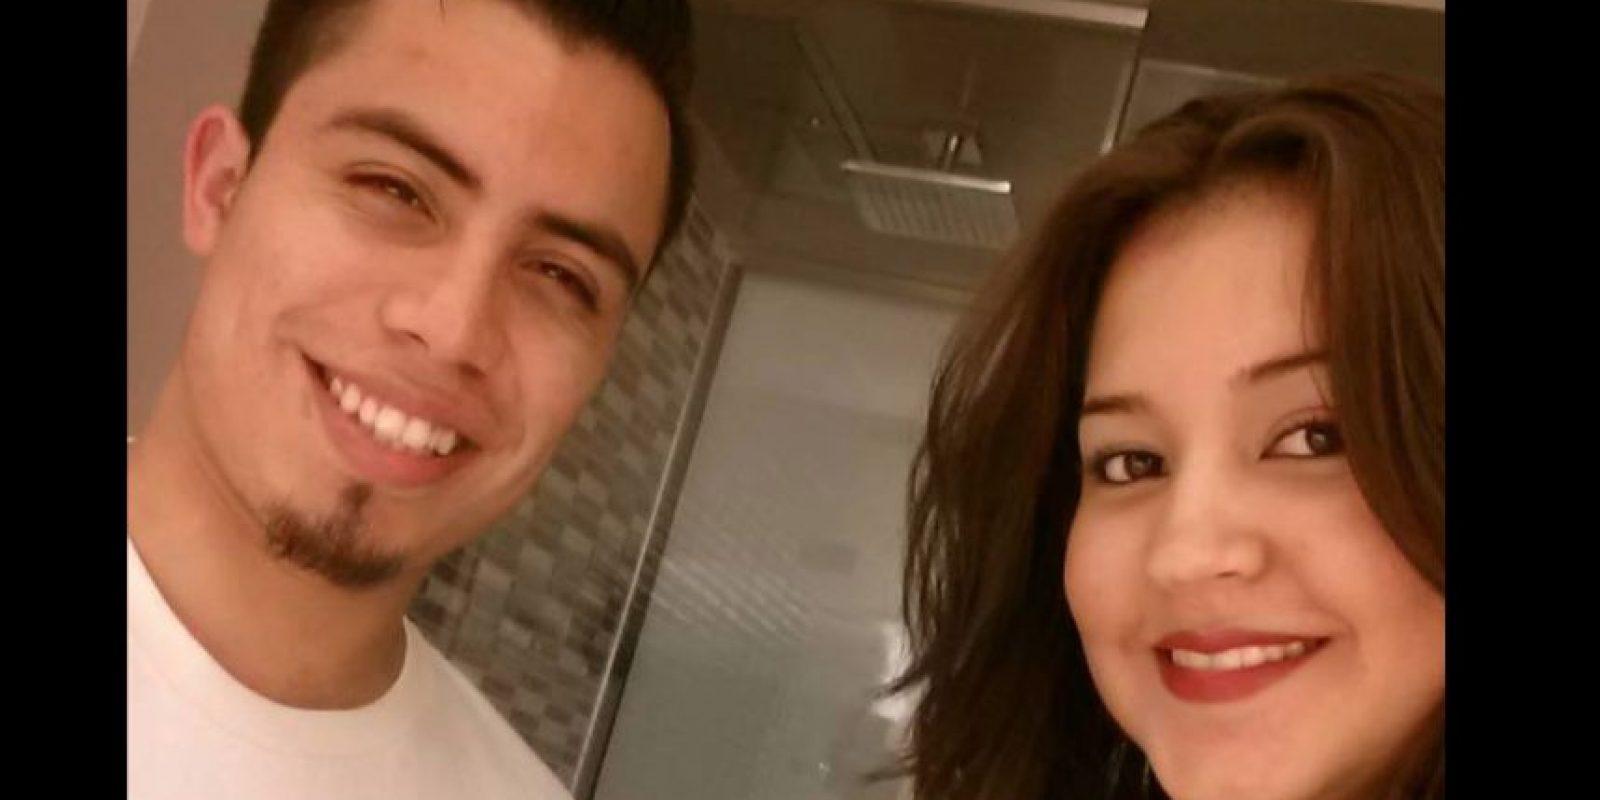 Carlos Steven Vásquez, fue joven que hizo publico el ataque de la mujer. Foto:Vía facebook.com/carlossteven.vasquez.9